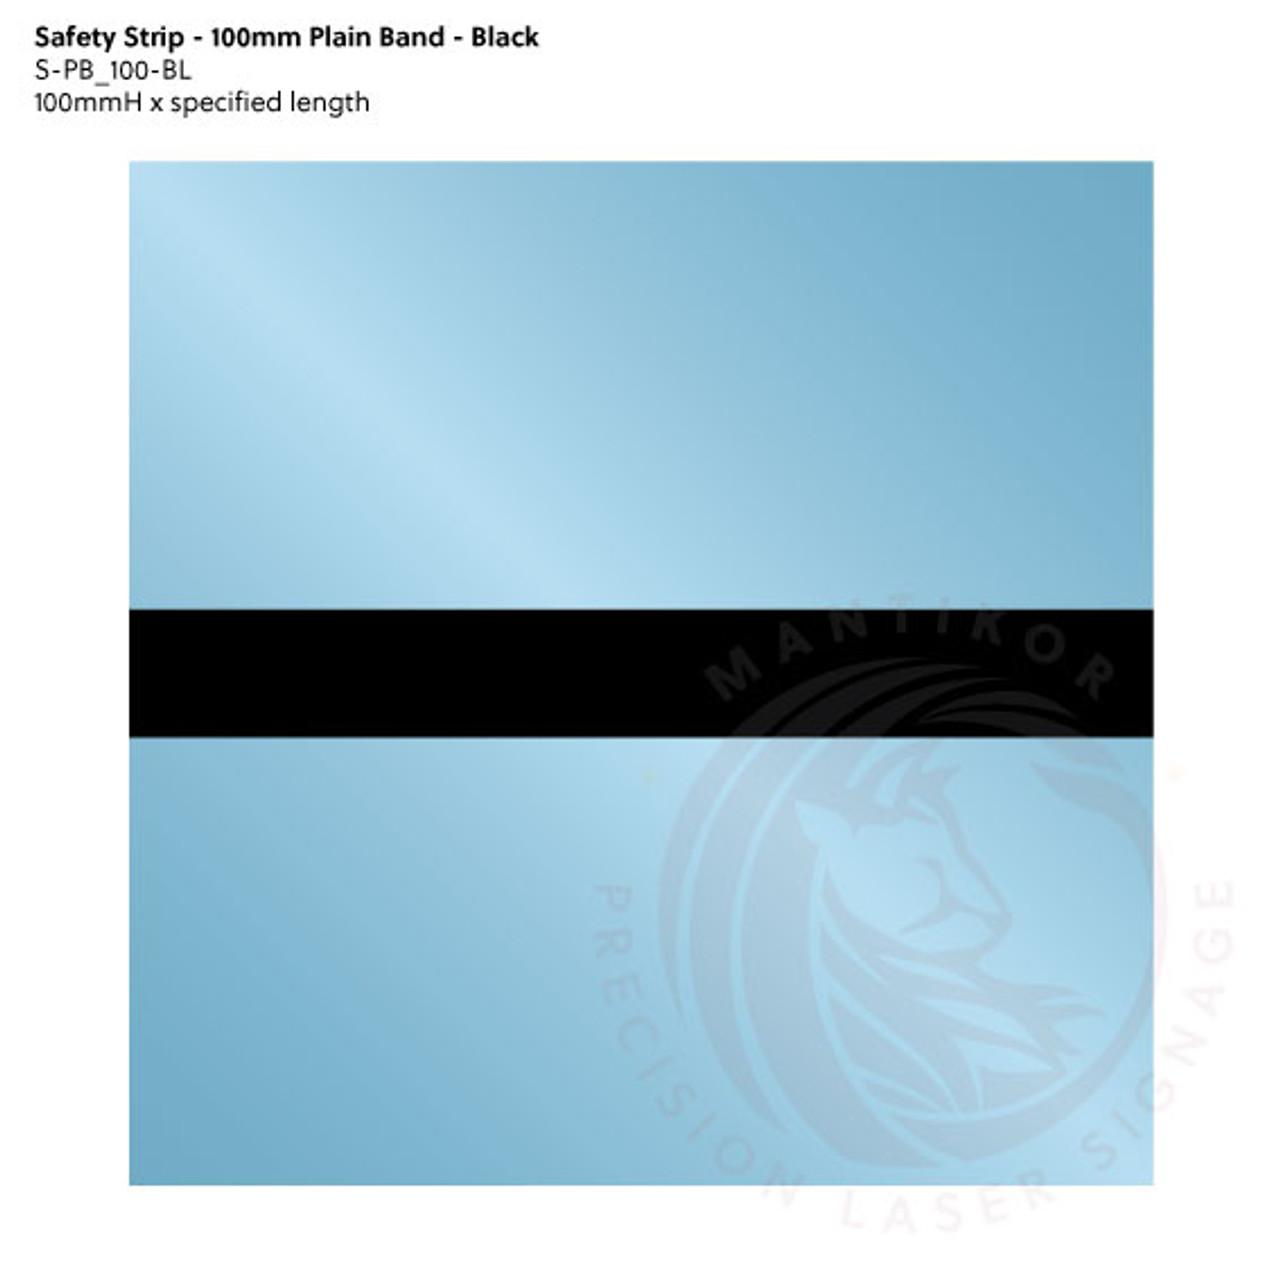 Visibility Strip - 100mm Plain Band - Black